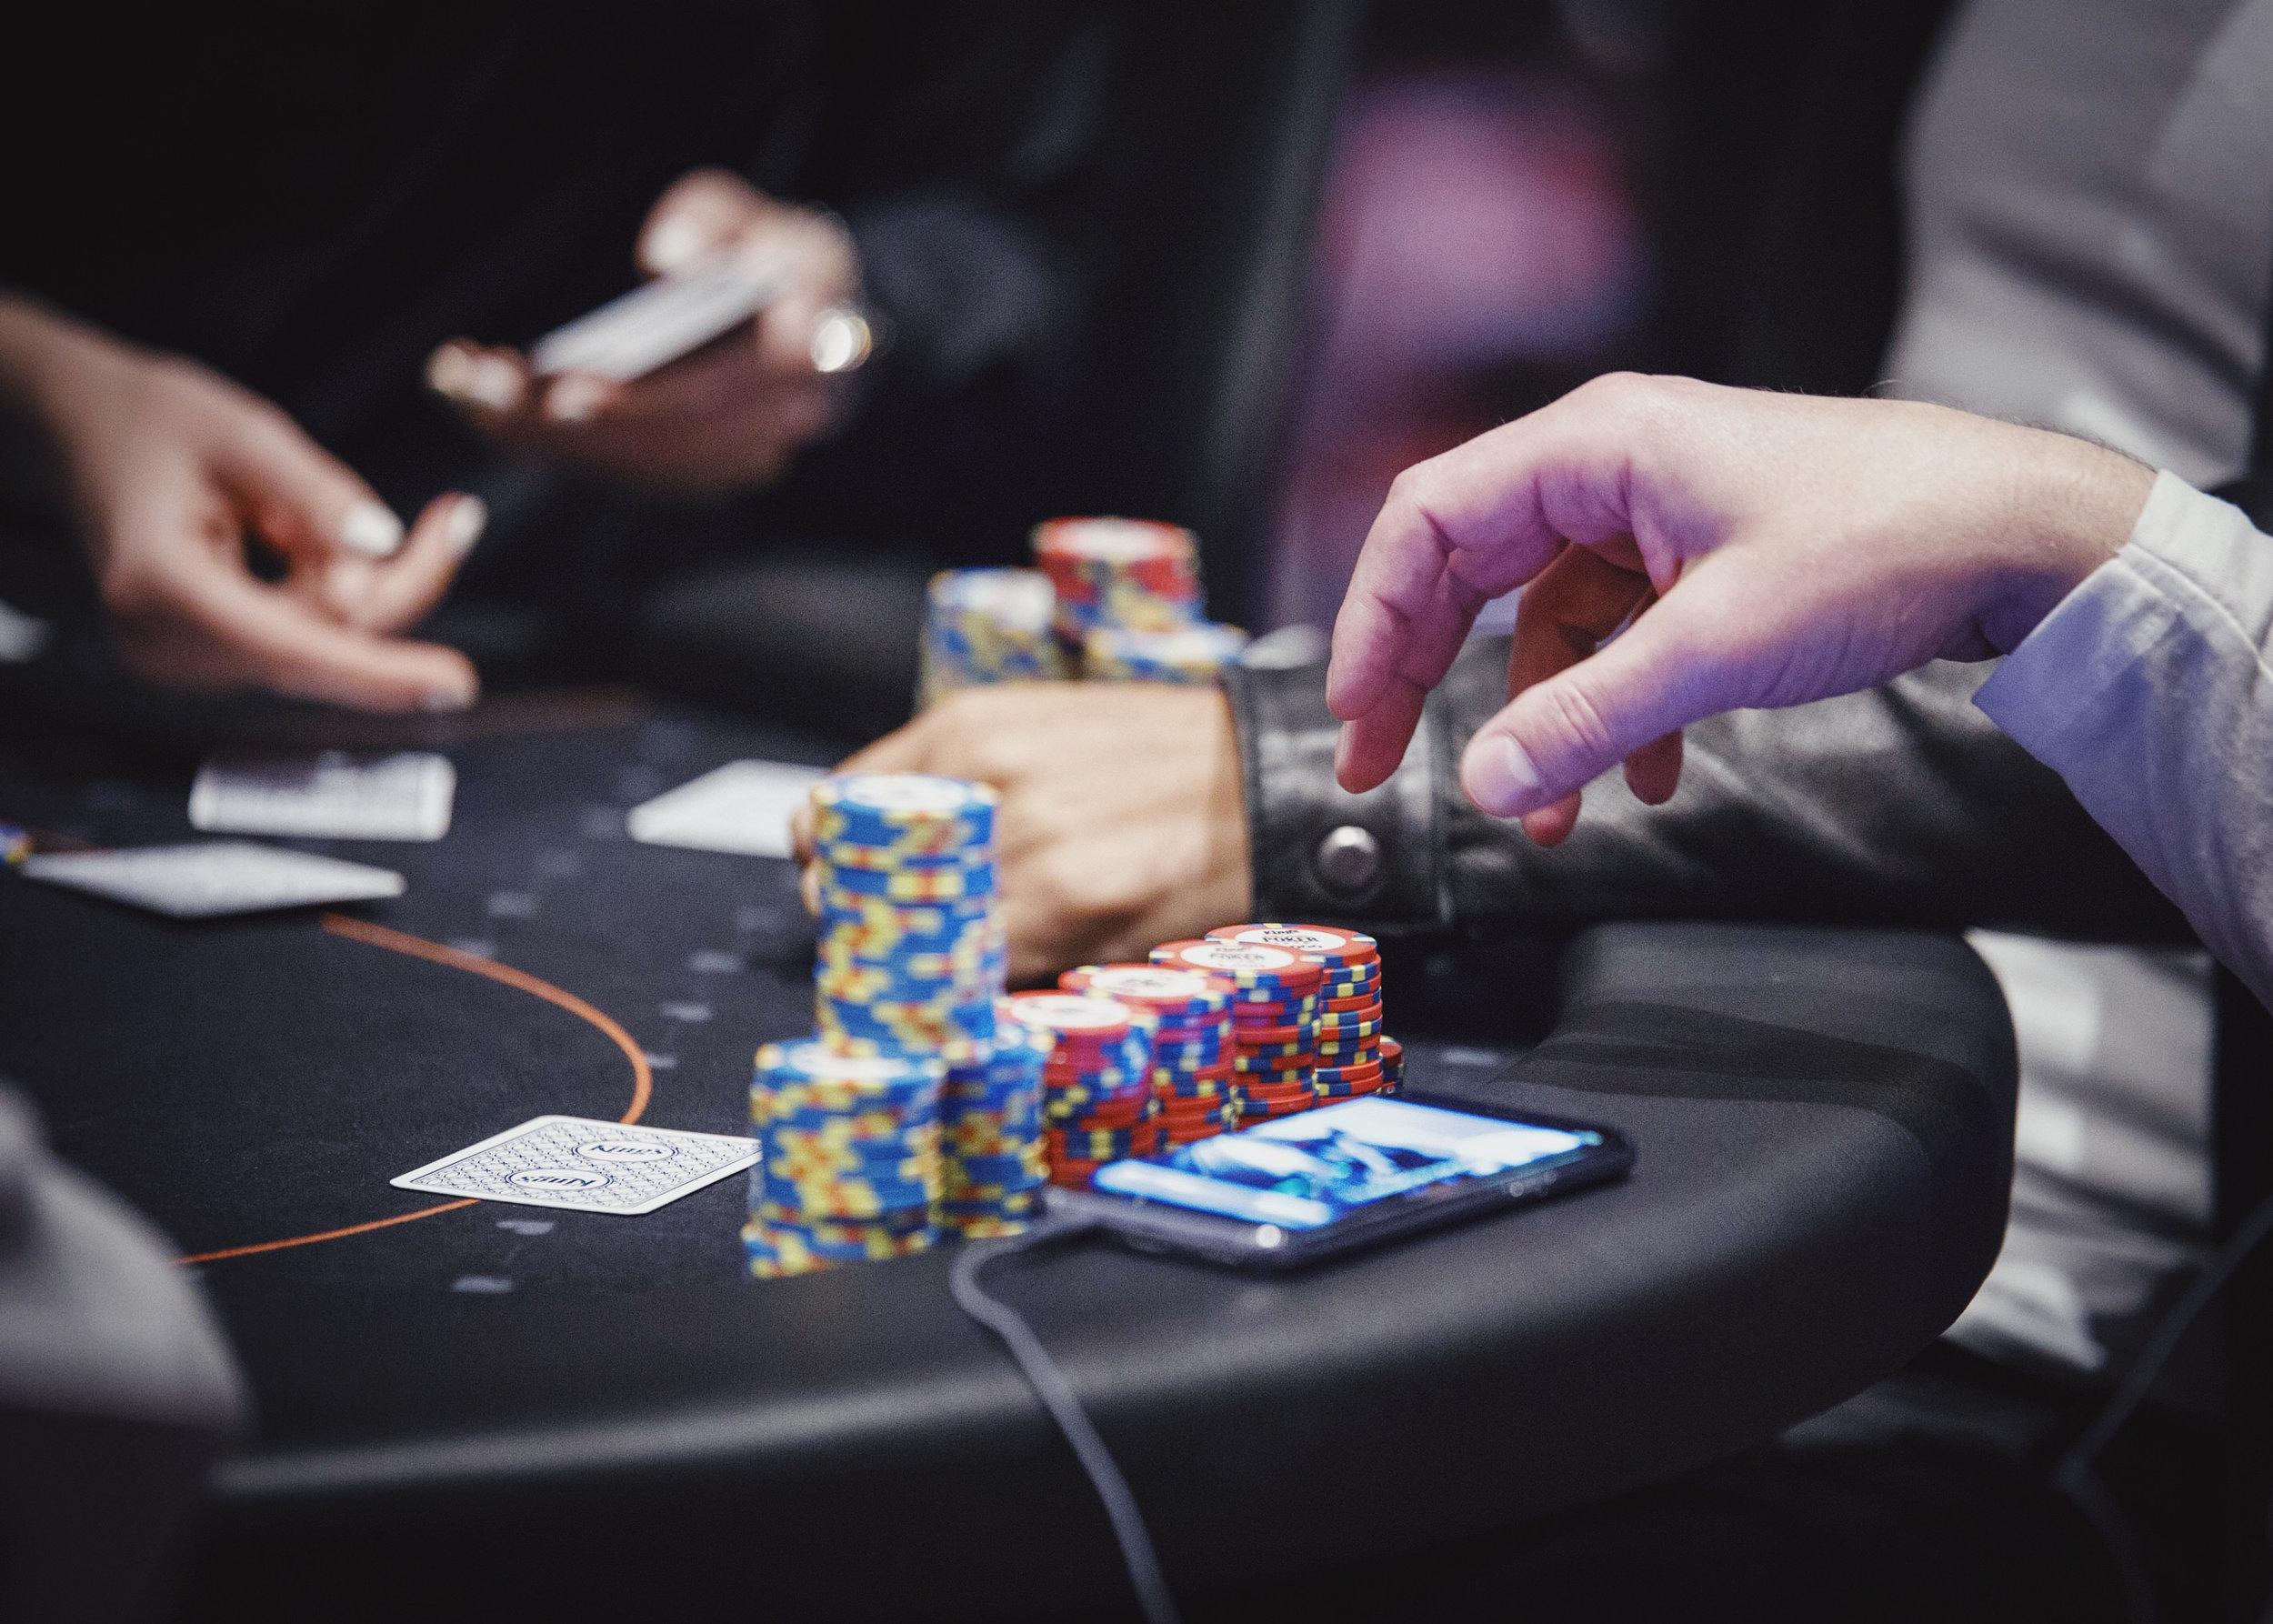 polina-shubkina-poker-024.JPG